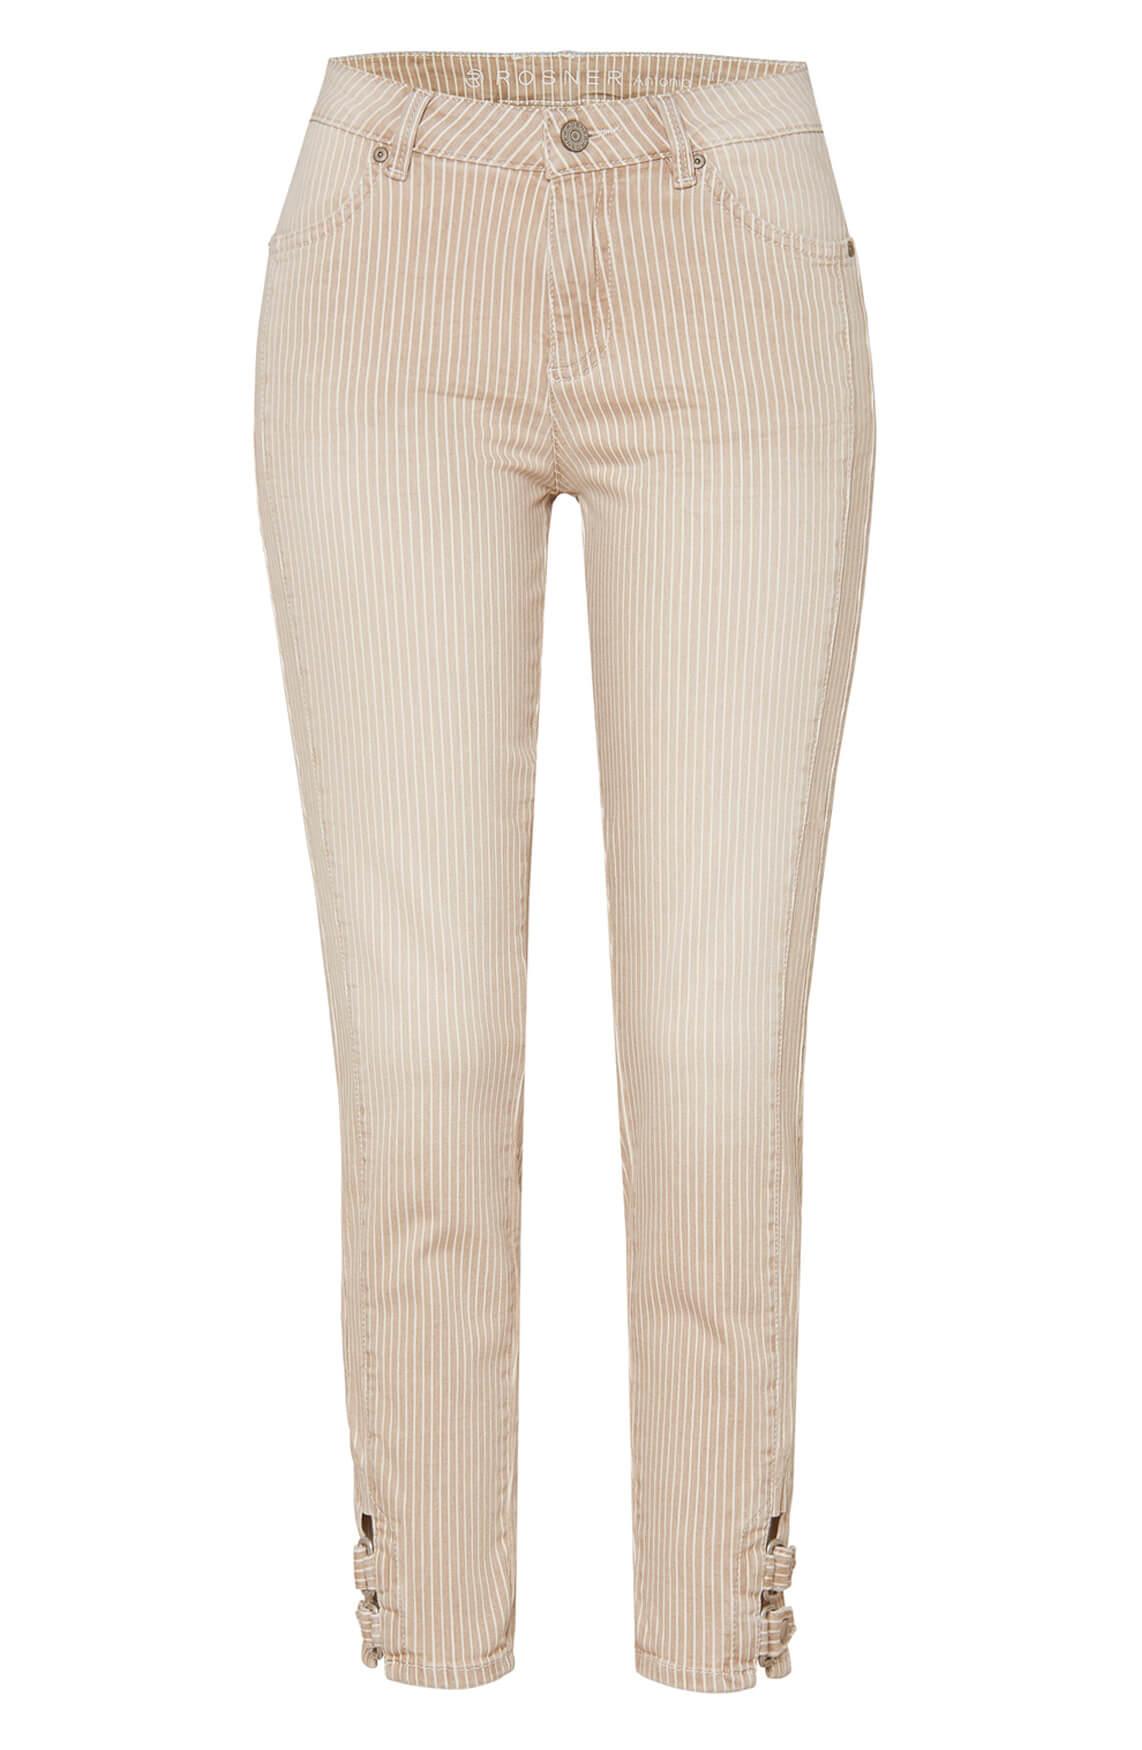 Rosner Dames Antonia gestreepte jeans Bruin